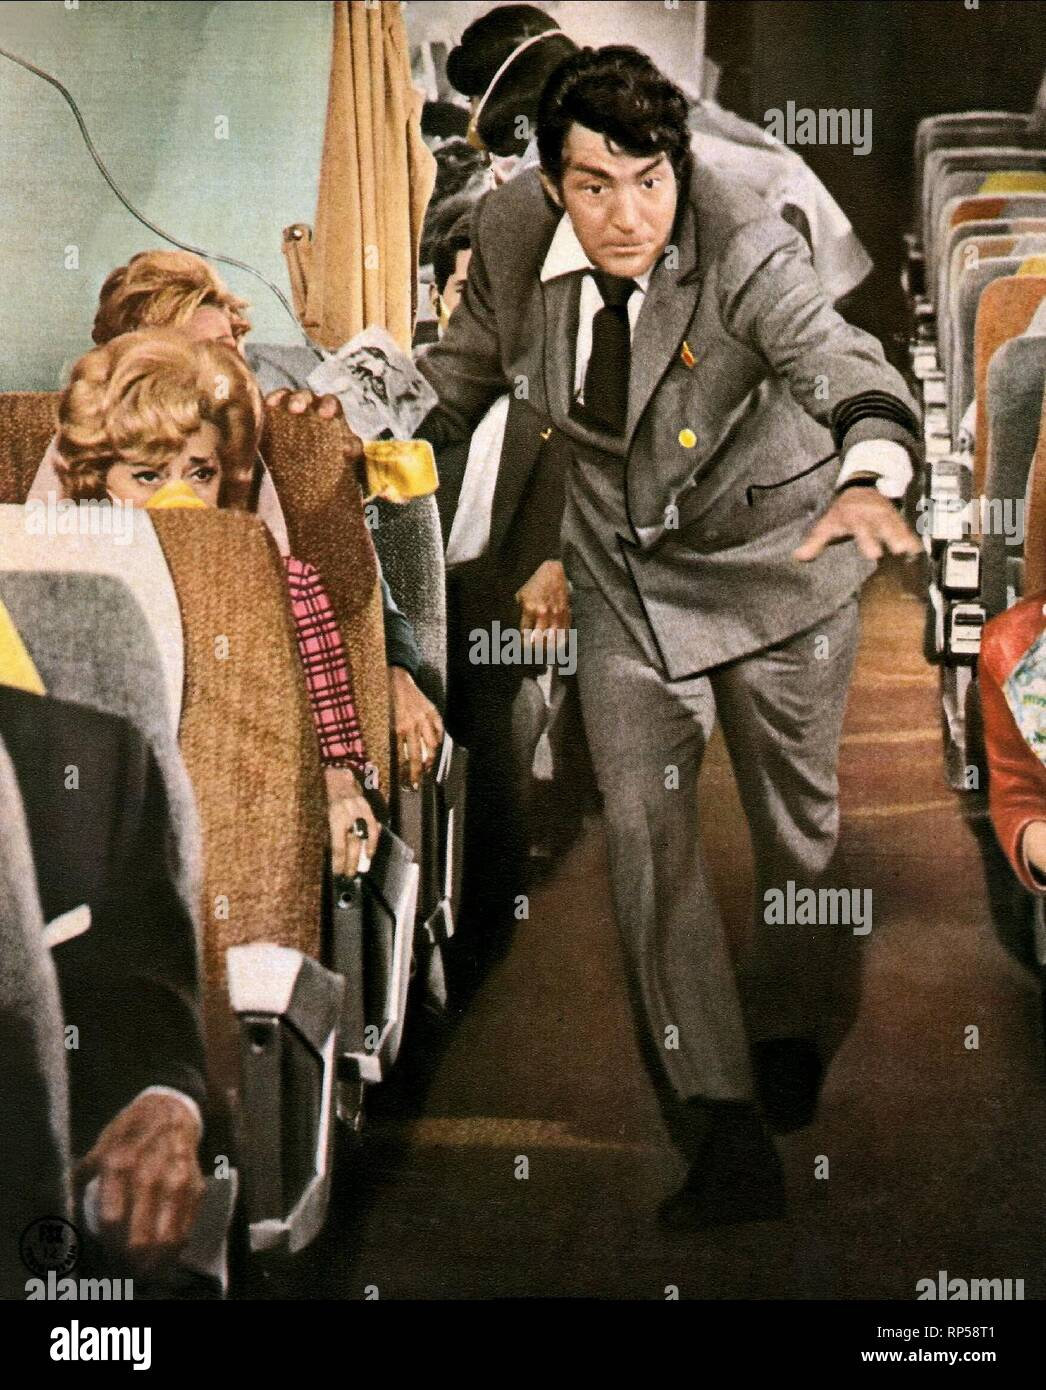 DEAN MARTIN, AIRPORT, 1970 Stock Photo - Alamy